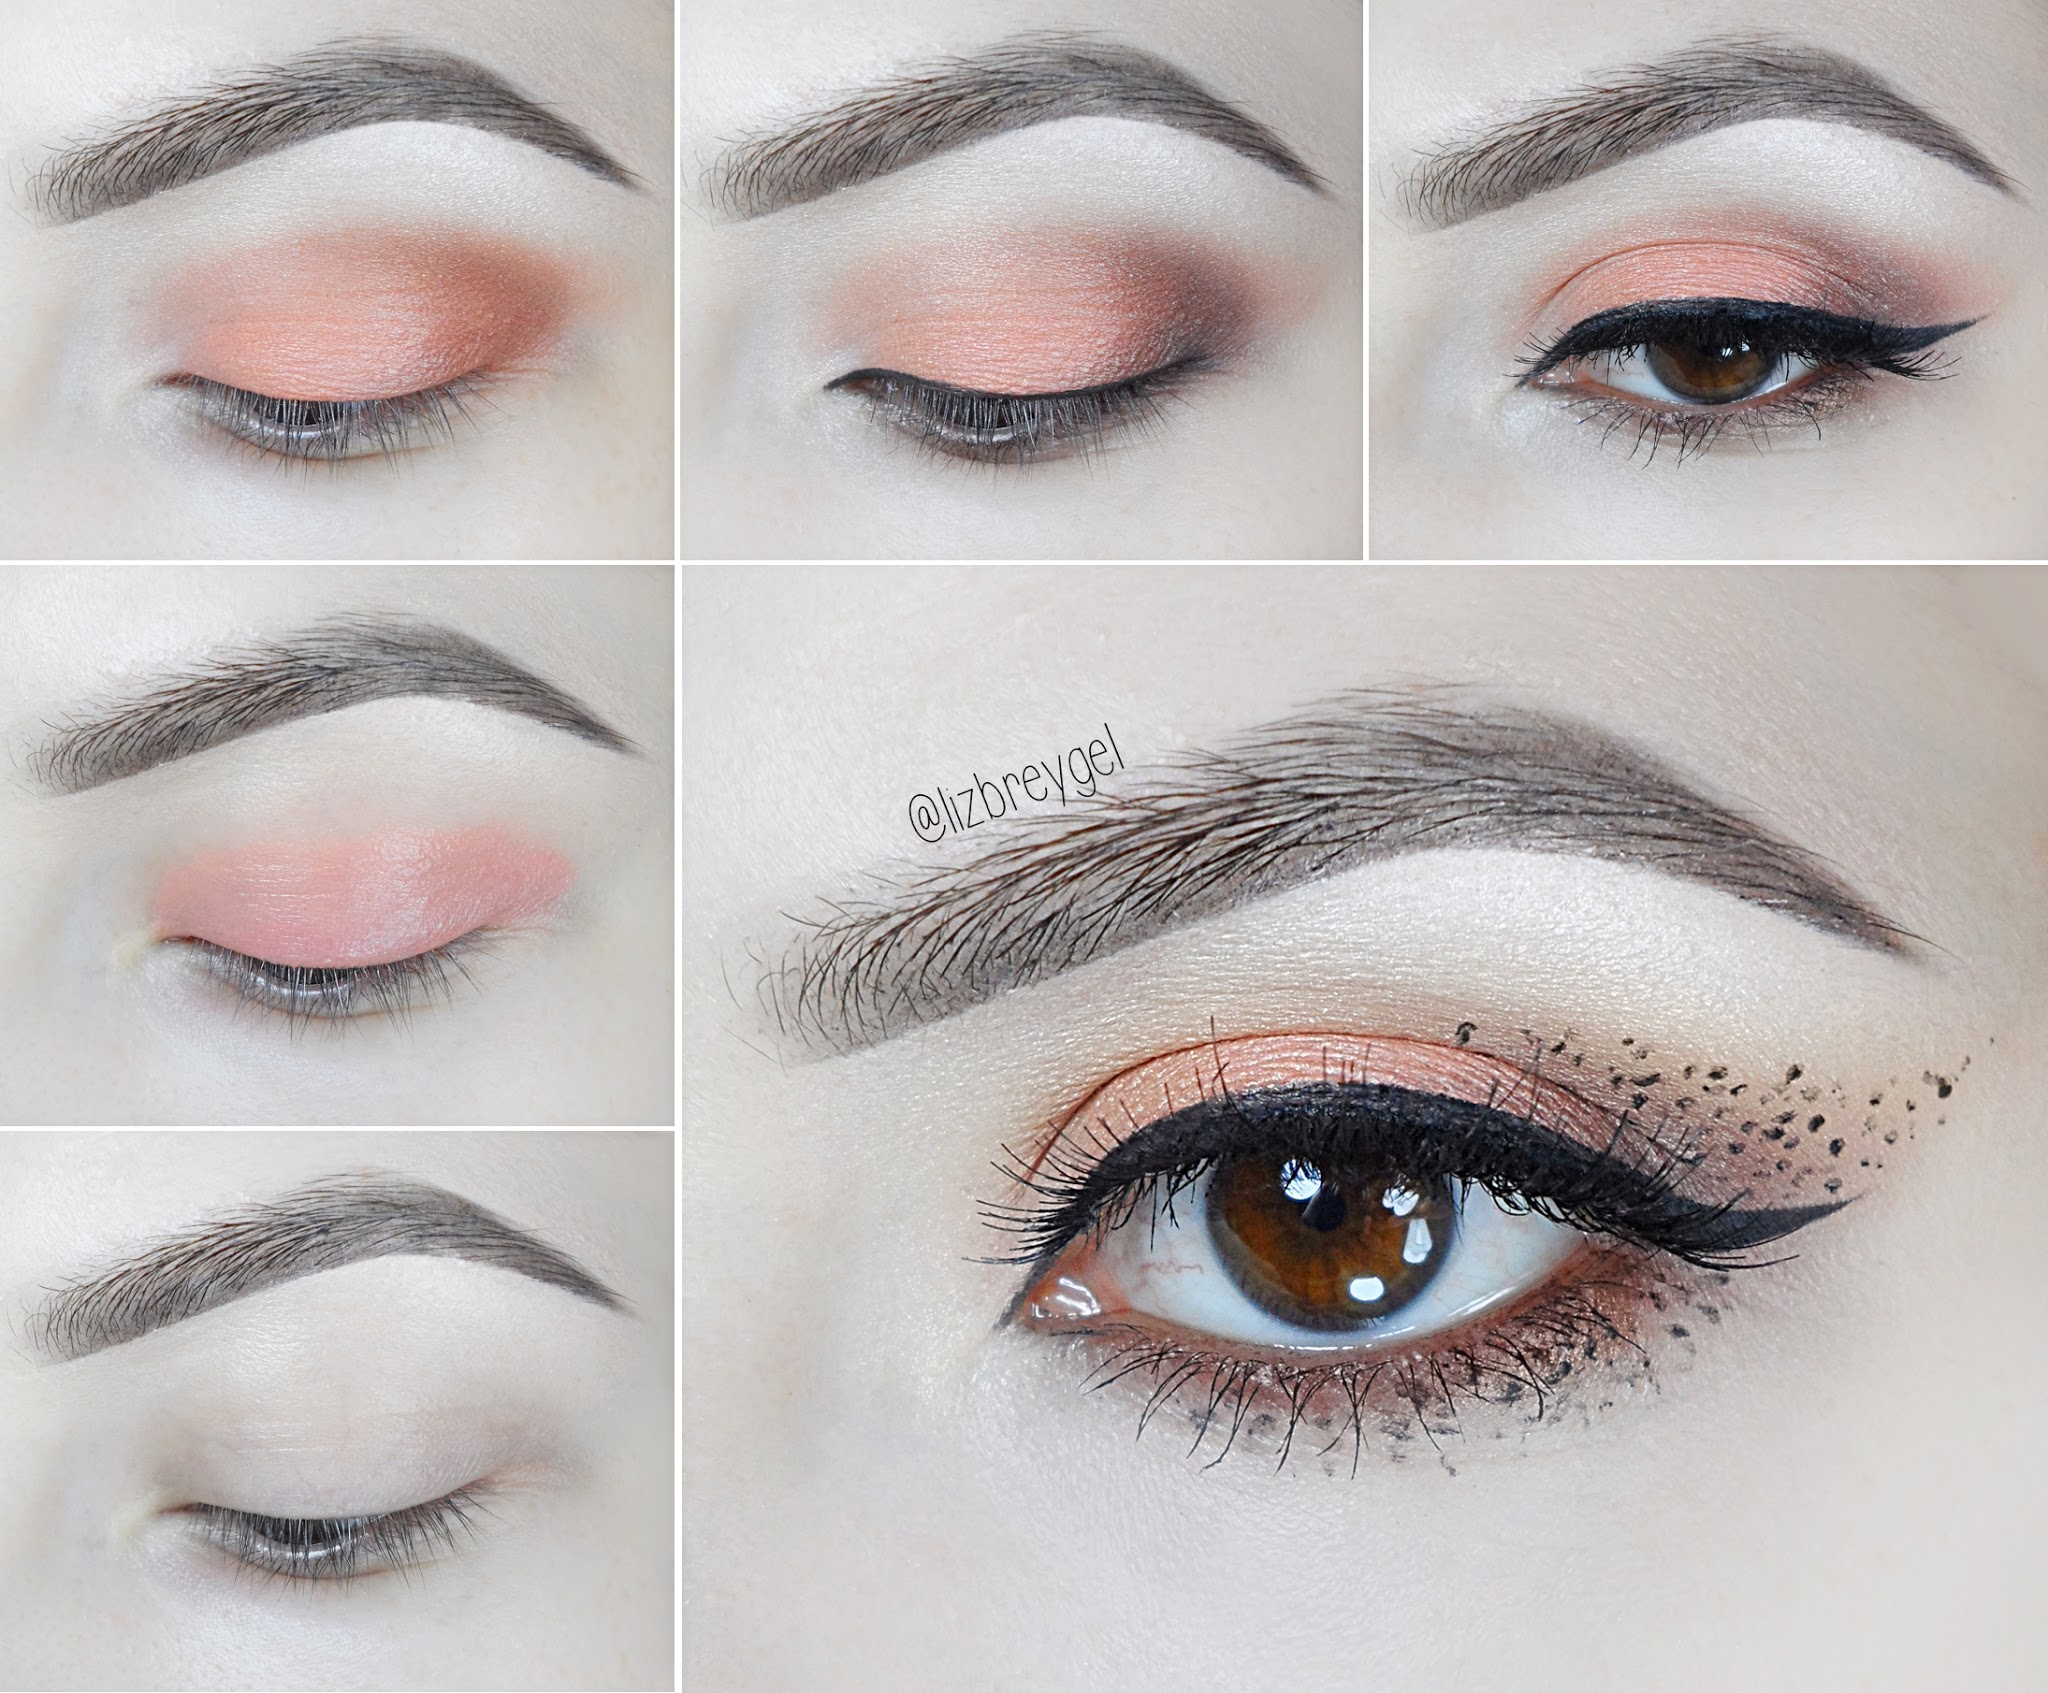 Pumpkin Spice Latte Makeup Tutorial | I ♥ Autumn by Liz Breygel on January Girl blog